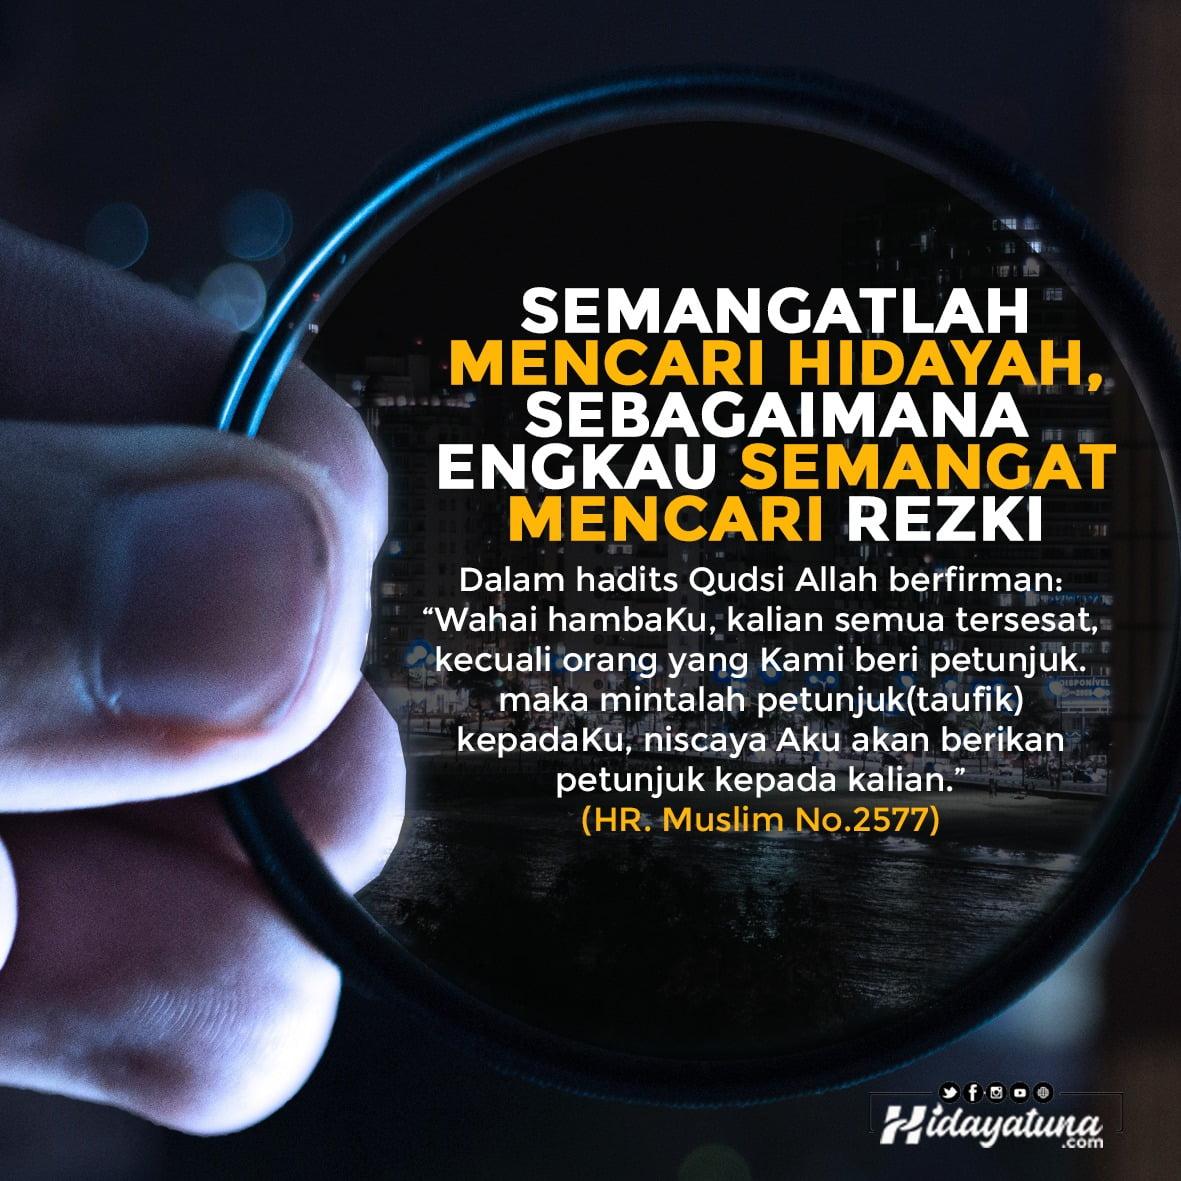 Kata Mutiara Hr Muslim No 2577 Hidayatuna